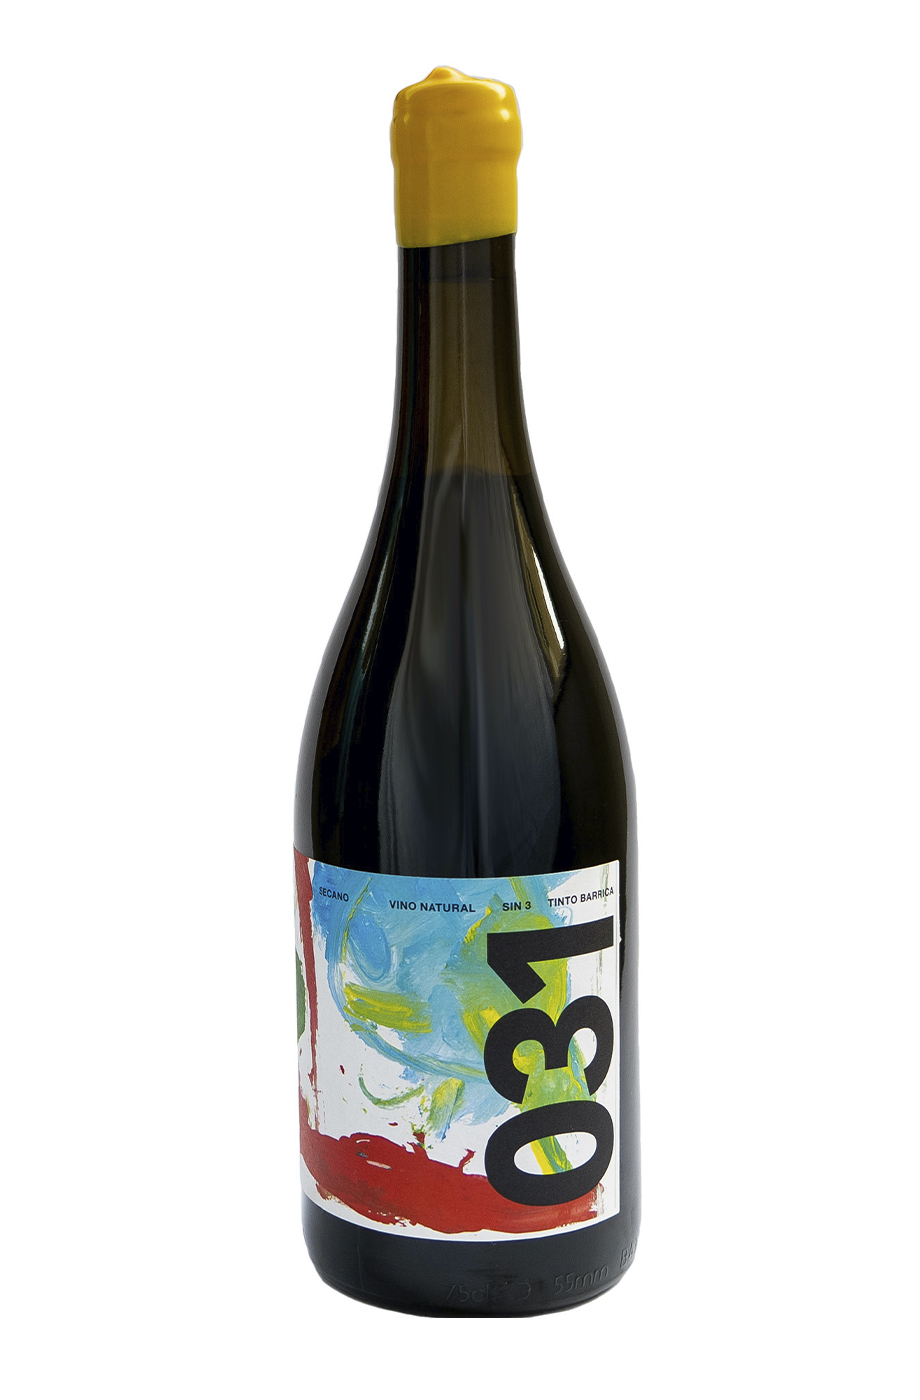 031 Tinto Barrica | Winexfood - Winexfood